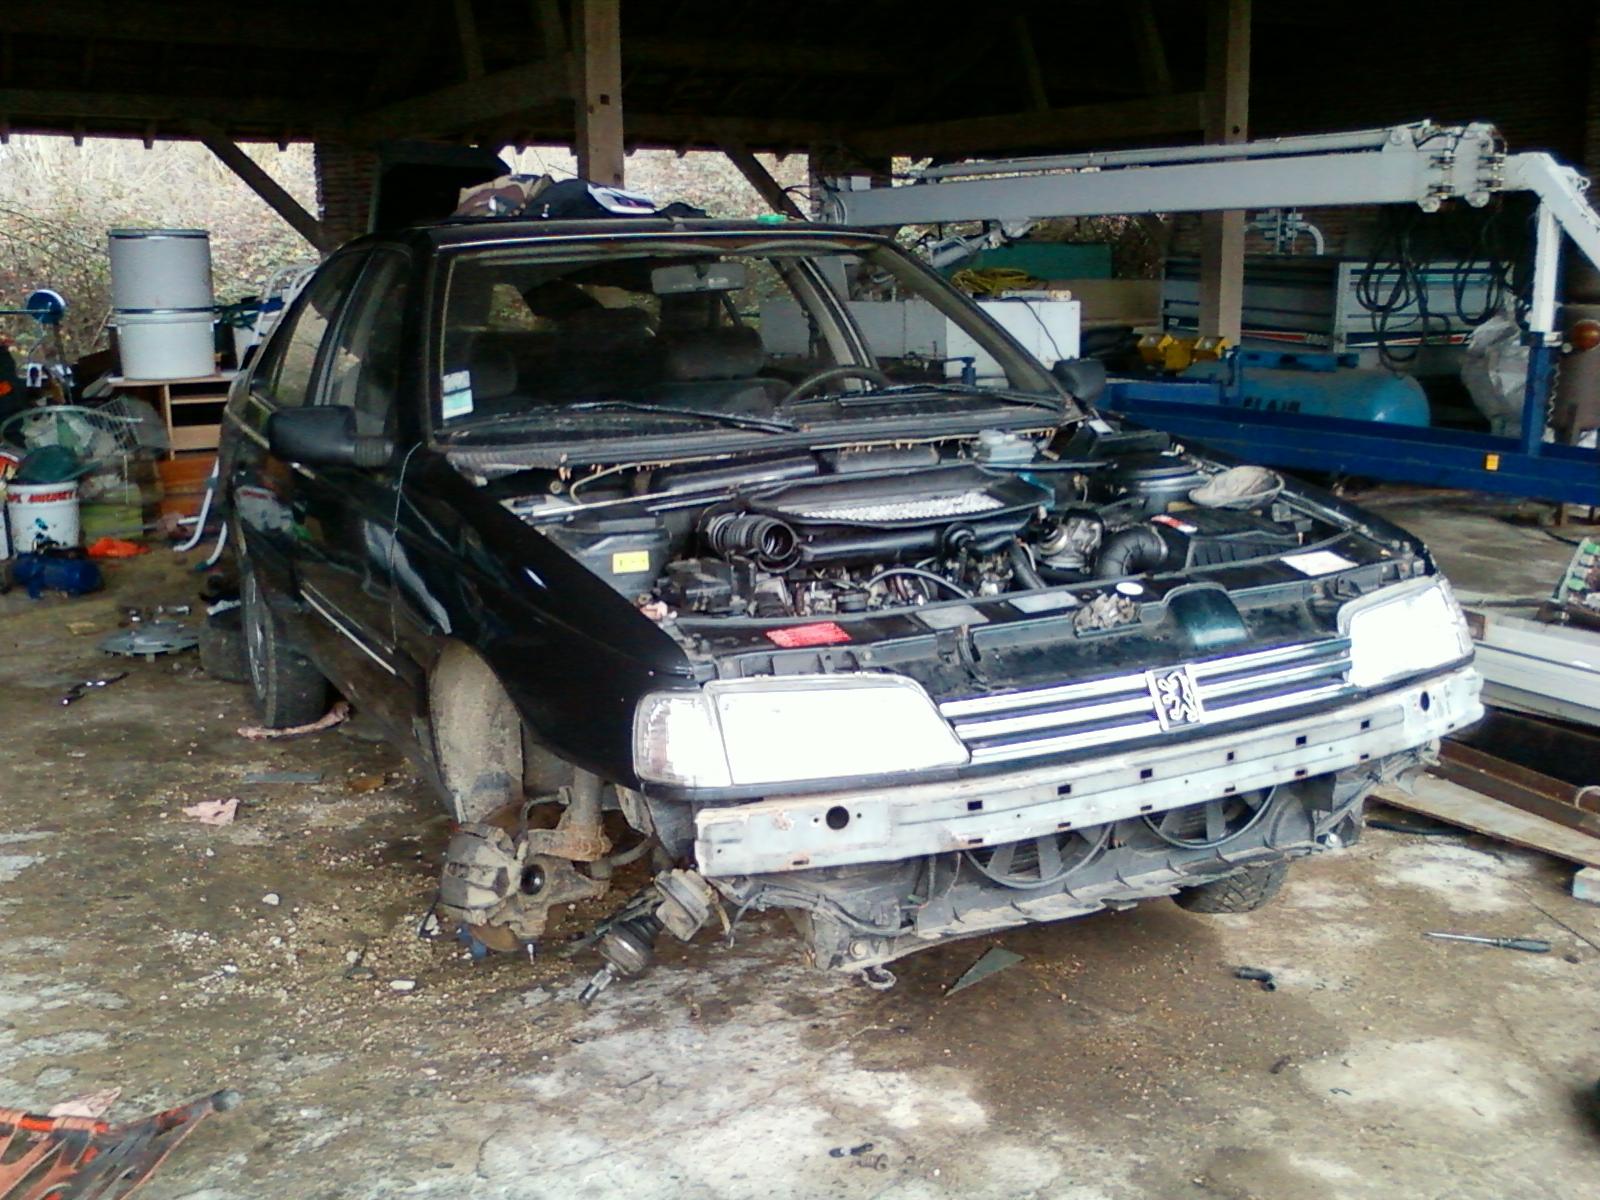 Changement moteur XUD7TE Peugeot 405 SRD turbo de Jordan. - Page 2 483791SPMA0054jpg